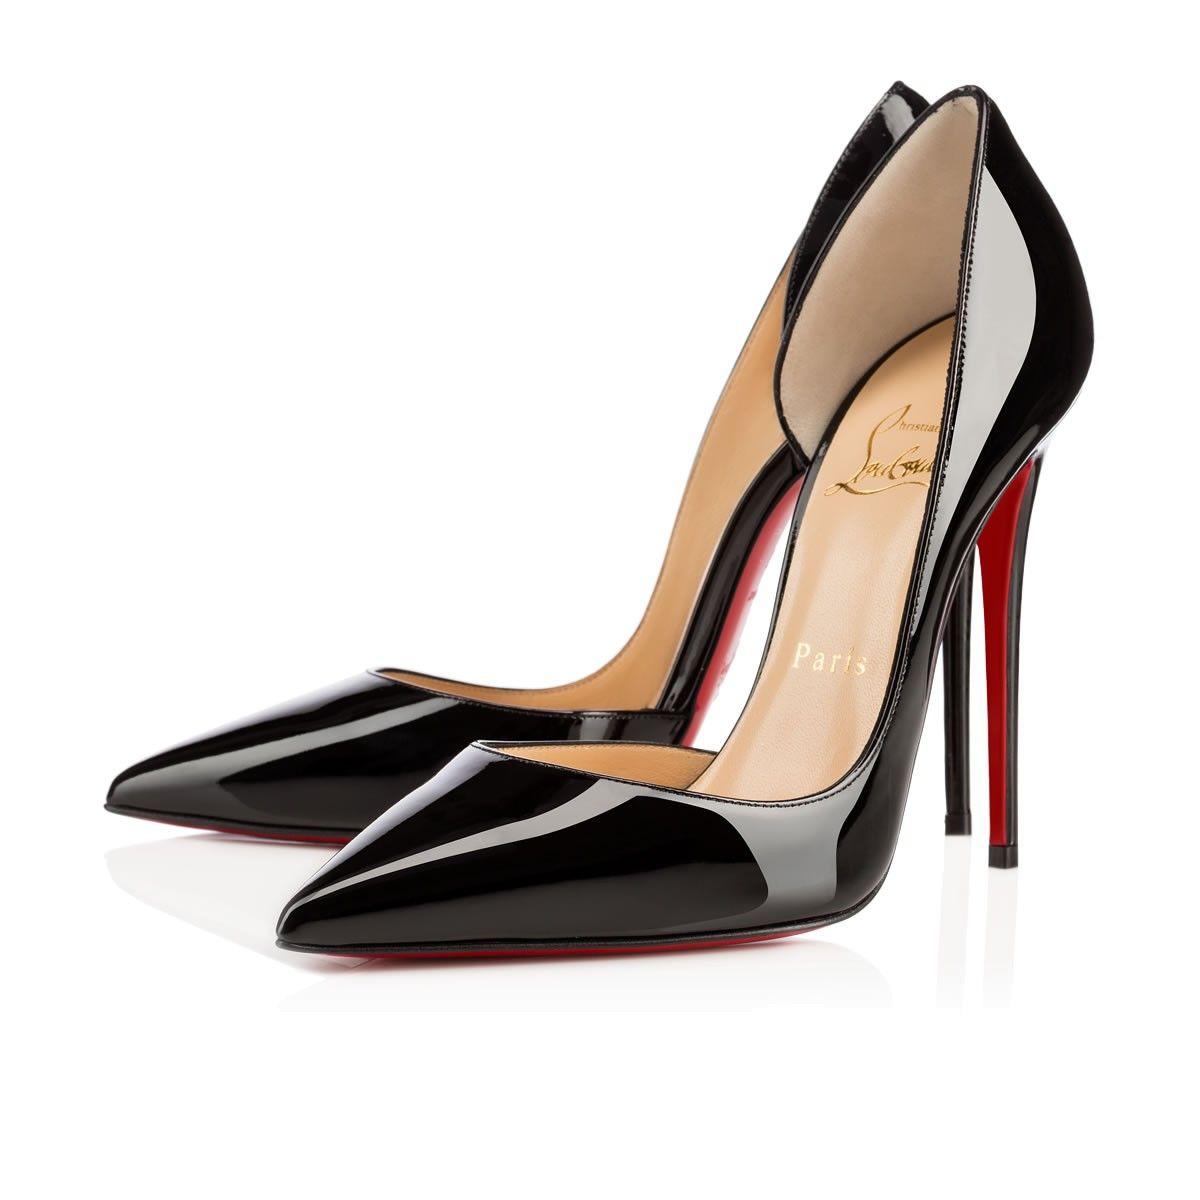 superior quality a88bc 4857a Iriza 120 BLACK Patent - Women Shoes - Christian Louboutin ...